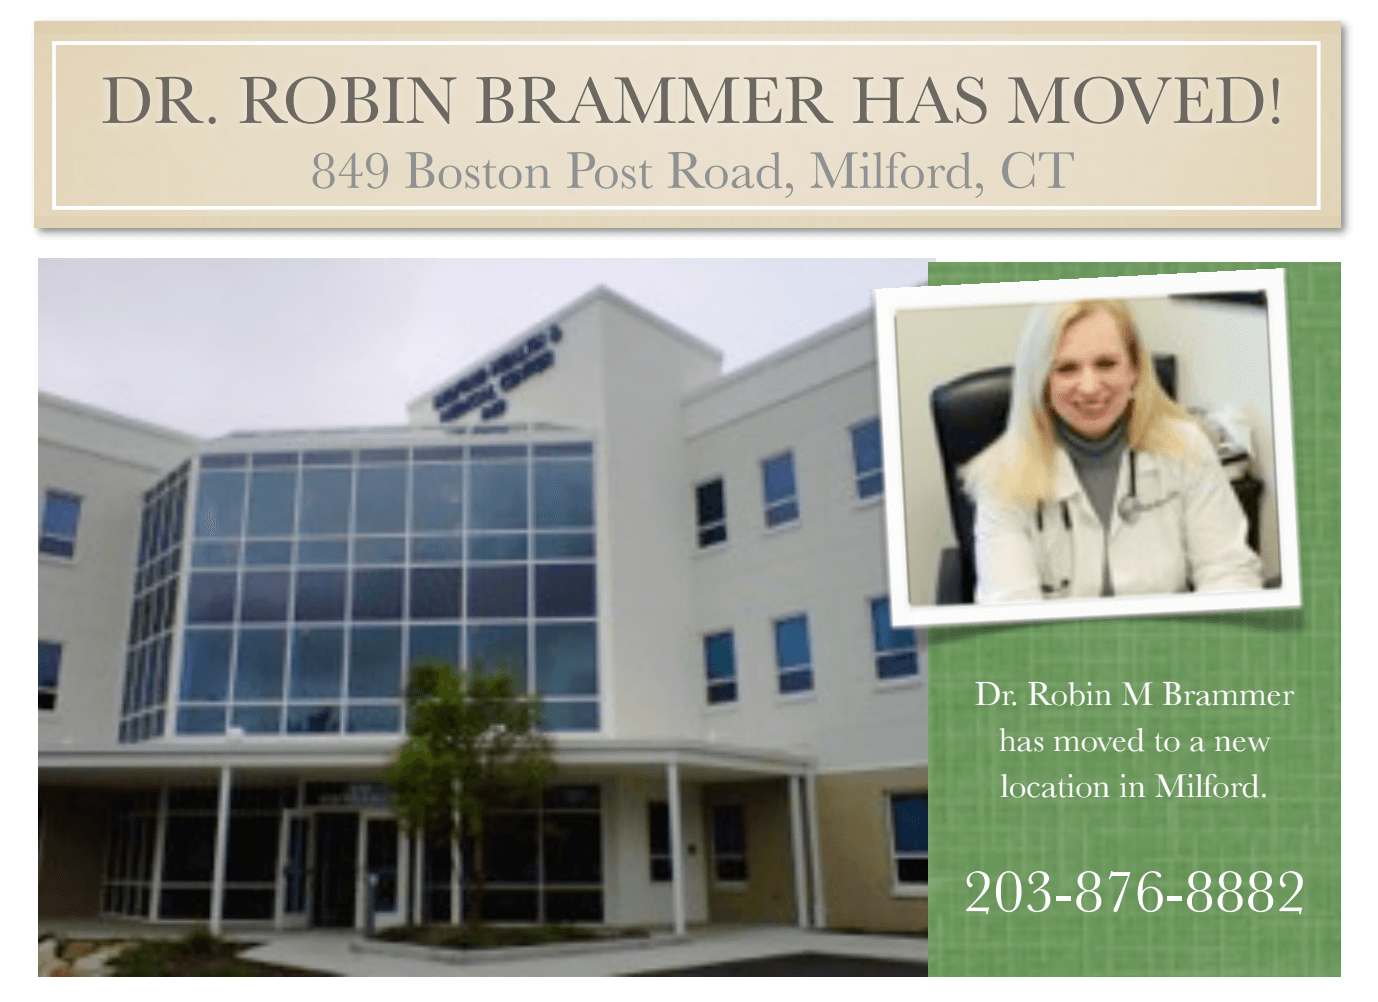 Dr. Robin Brammer